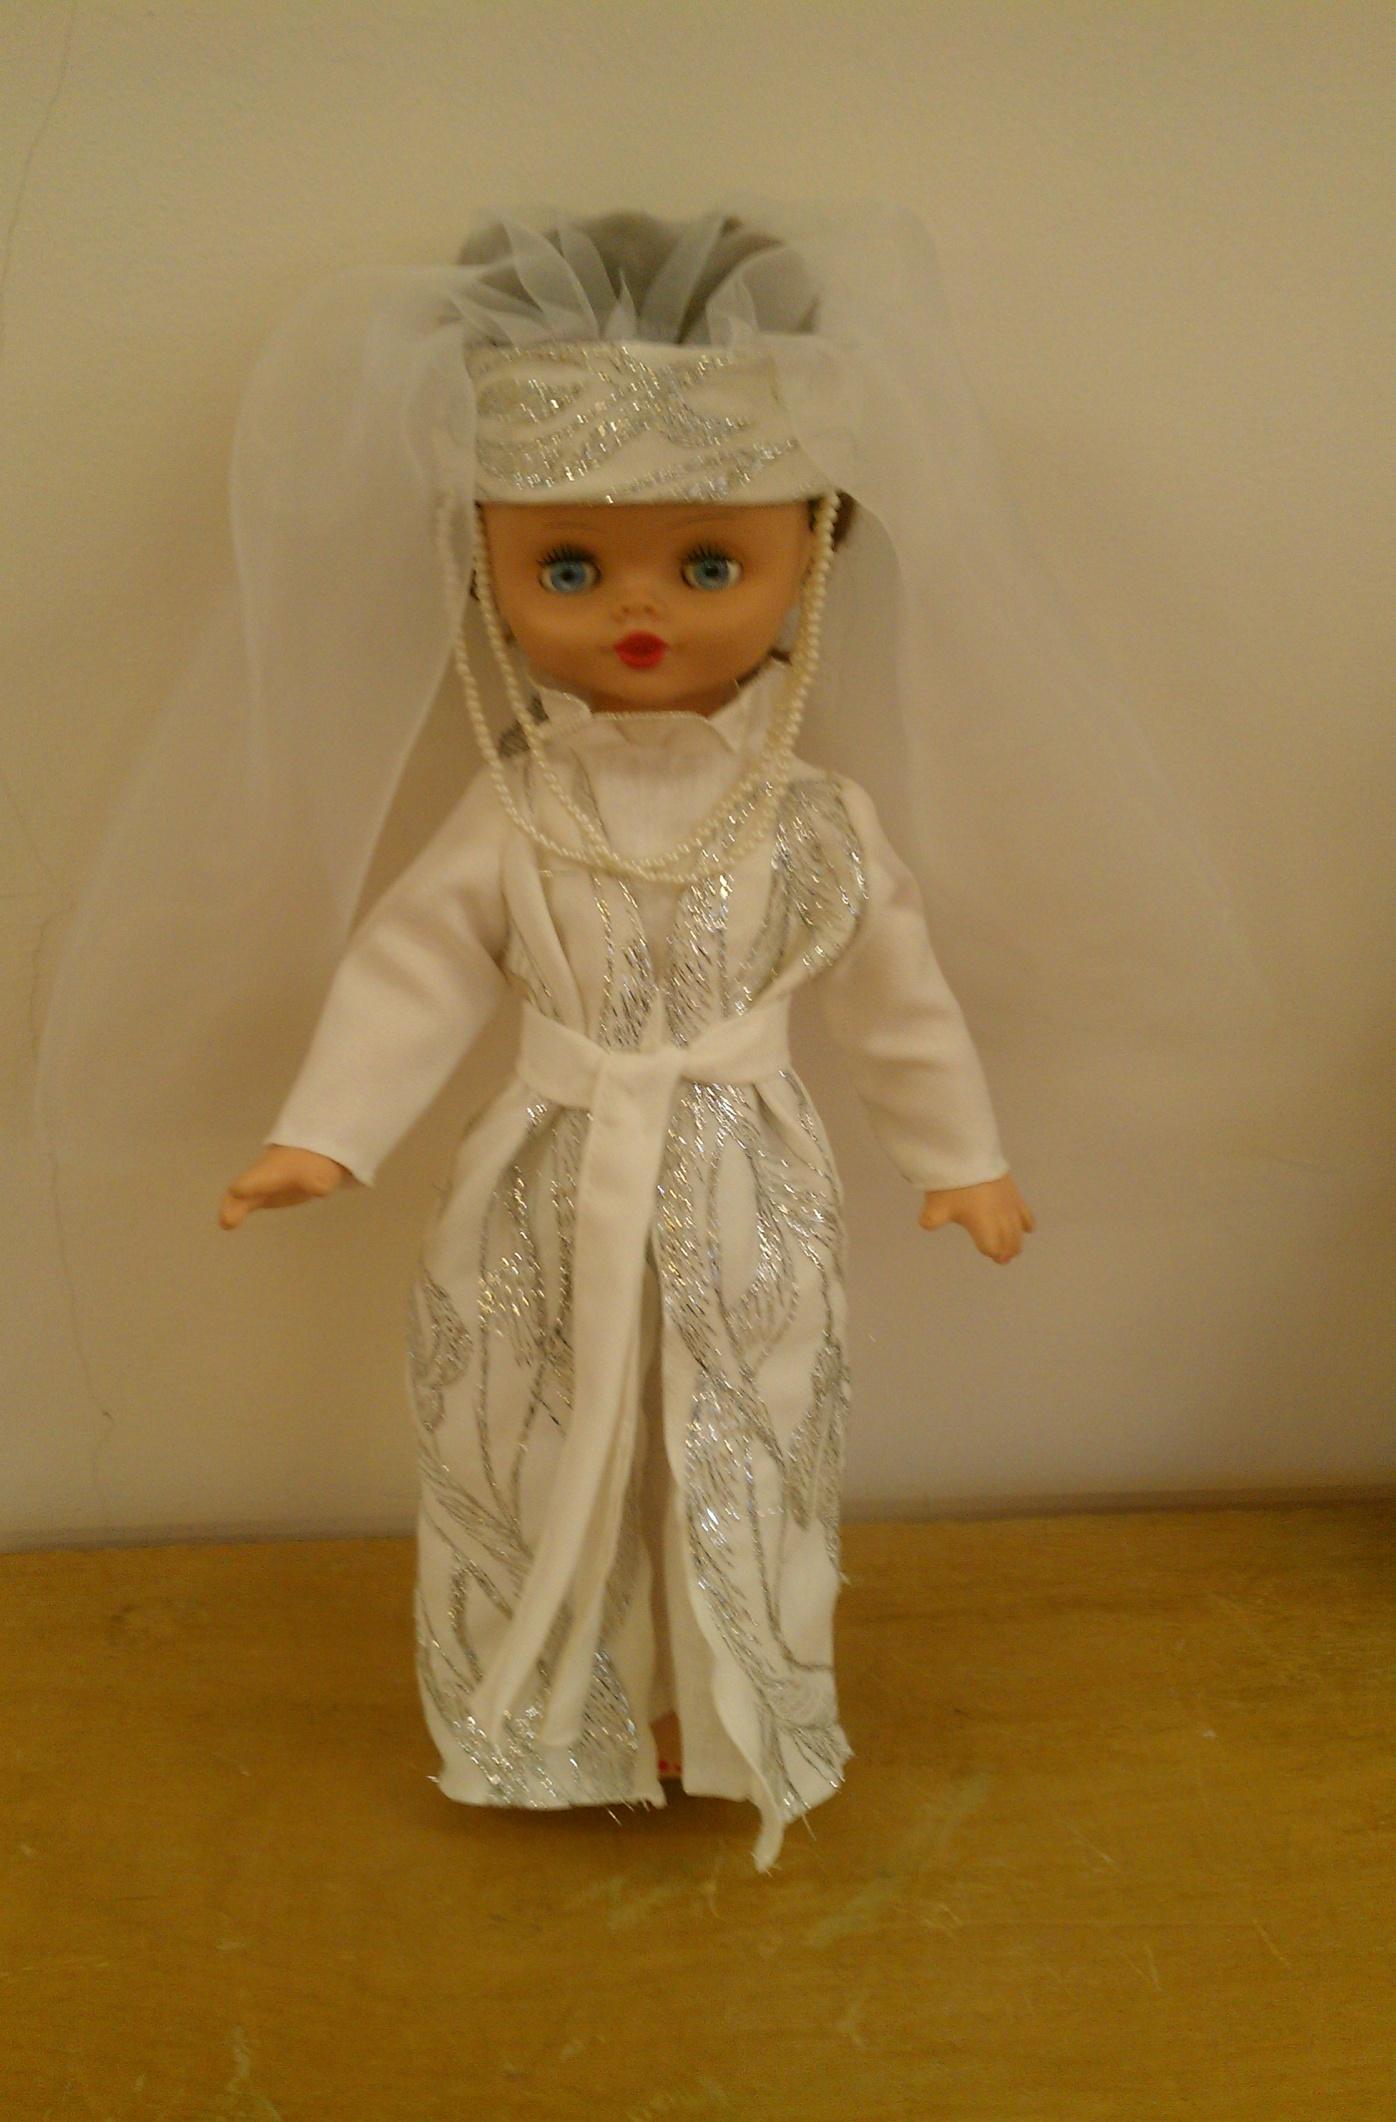 C:\Users\PC\Documents\Моя малая родина 2014\куклы\IMAG2600.jpg